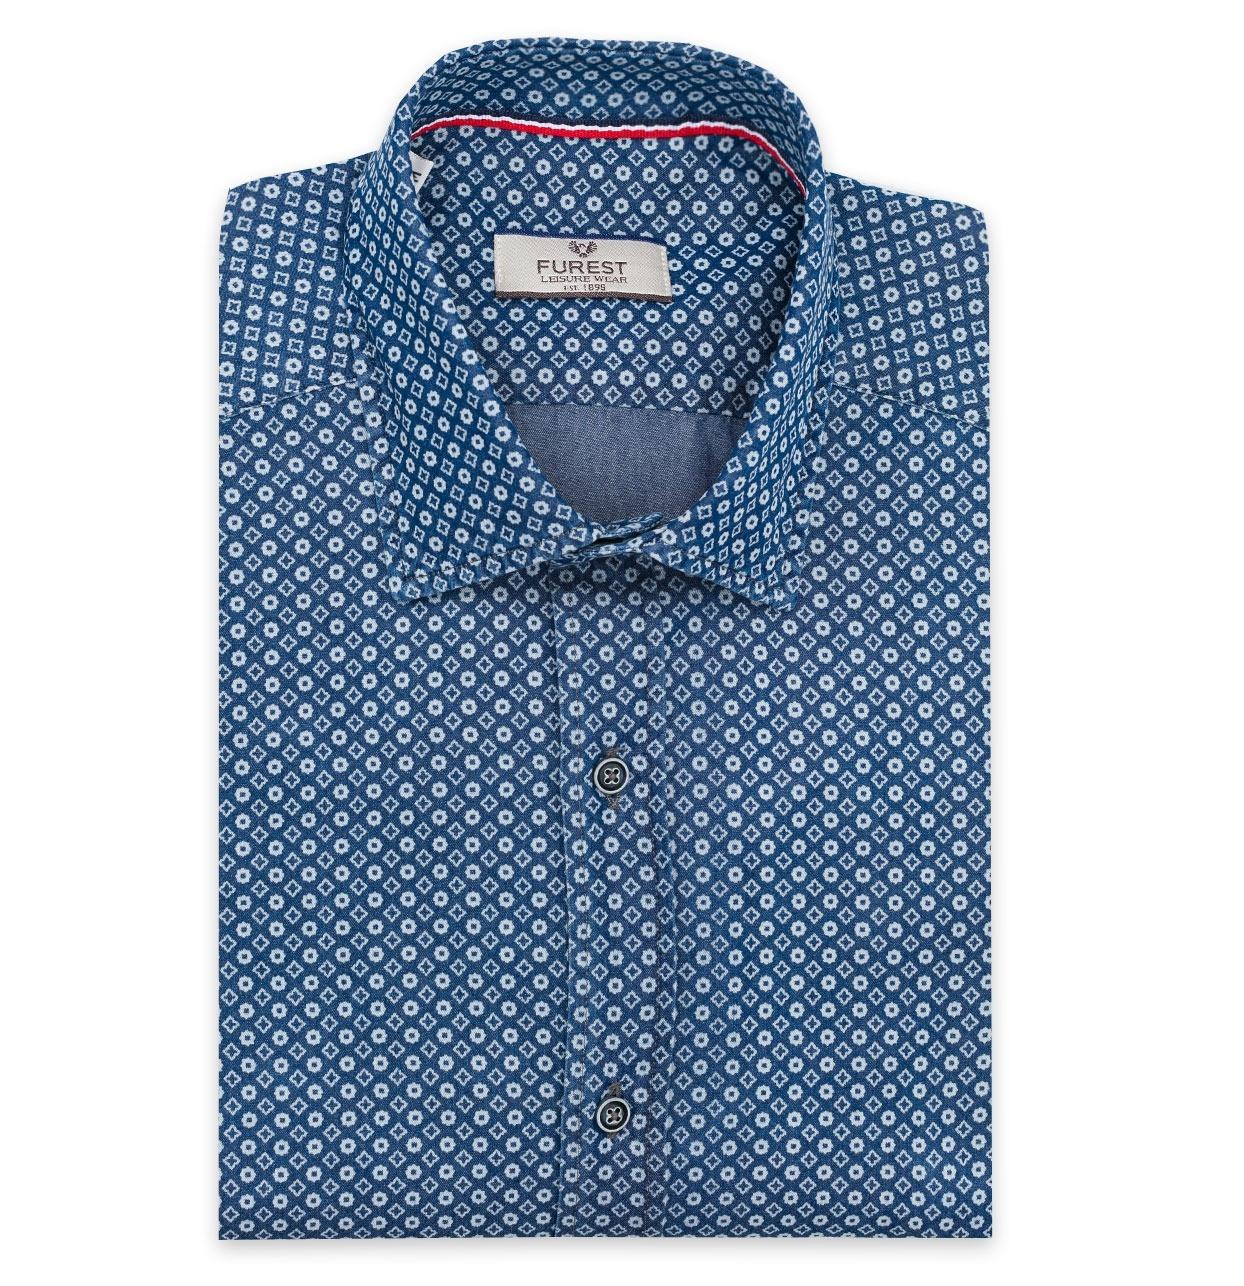 Camisa Leisure Wear REGULAR FIT Modelo PORTO dibujo geométrico color azul denim, 100% Algodón.